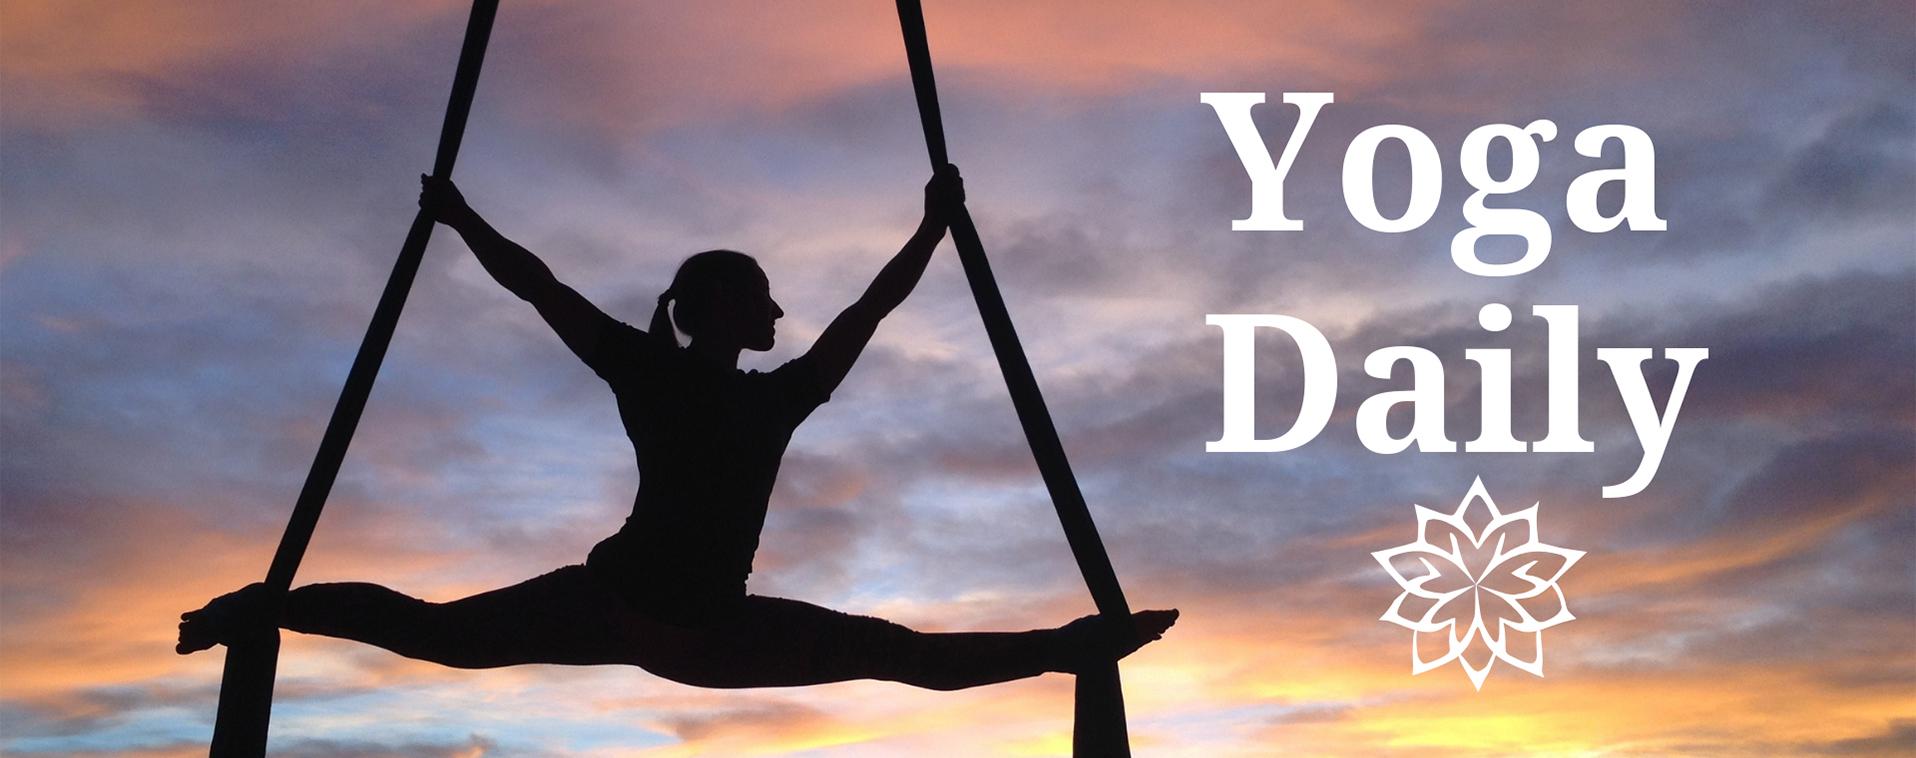 Yoga Daily 1916x758